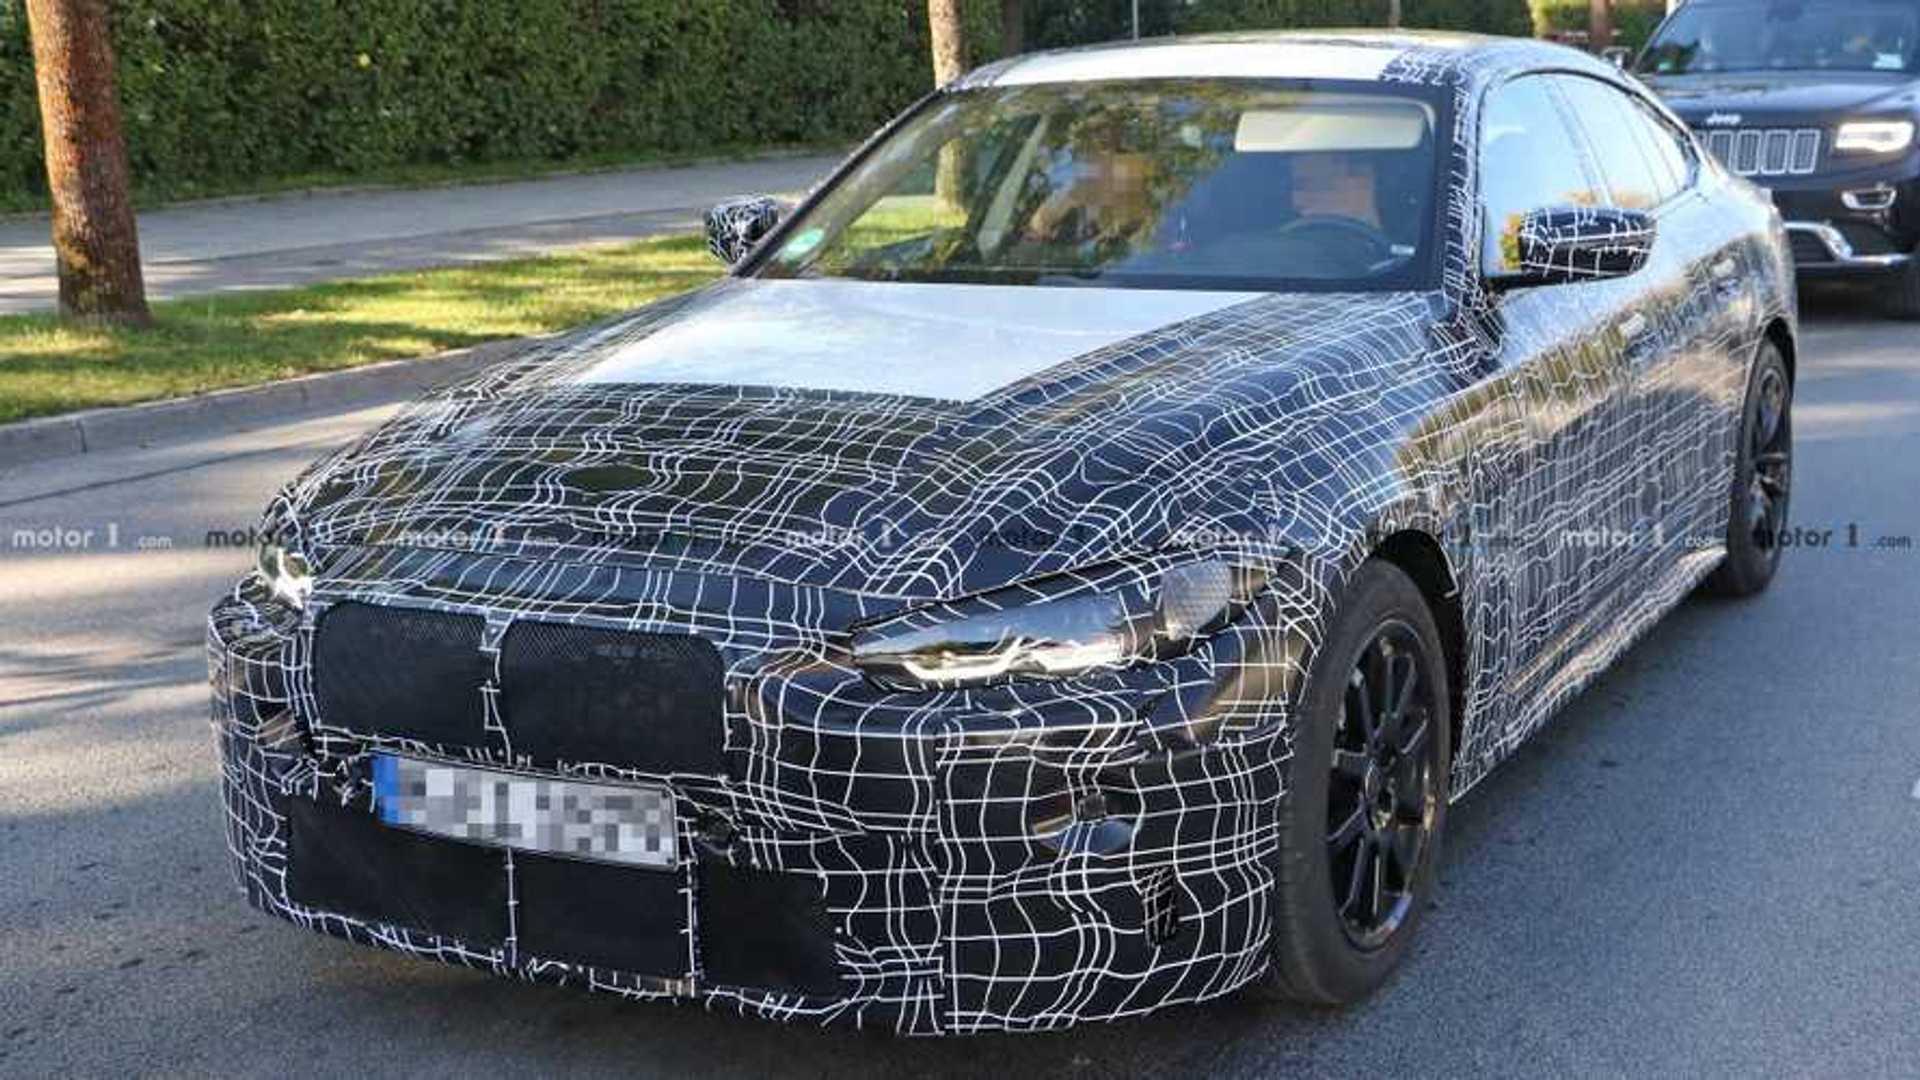 2020 - [BMW] Série 4 Gran Coupé [G26] Bmw-4-series-gran-coupe-new-spy-photo